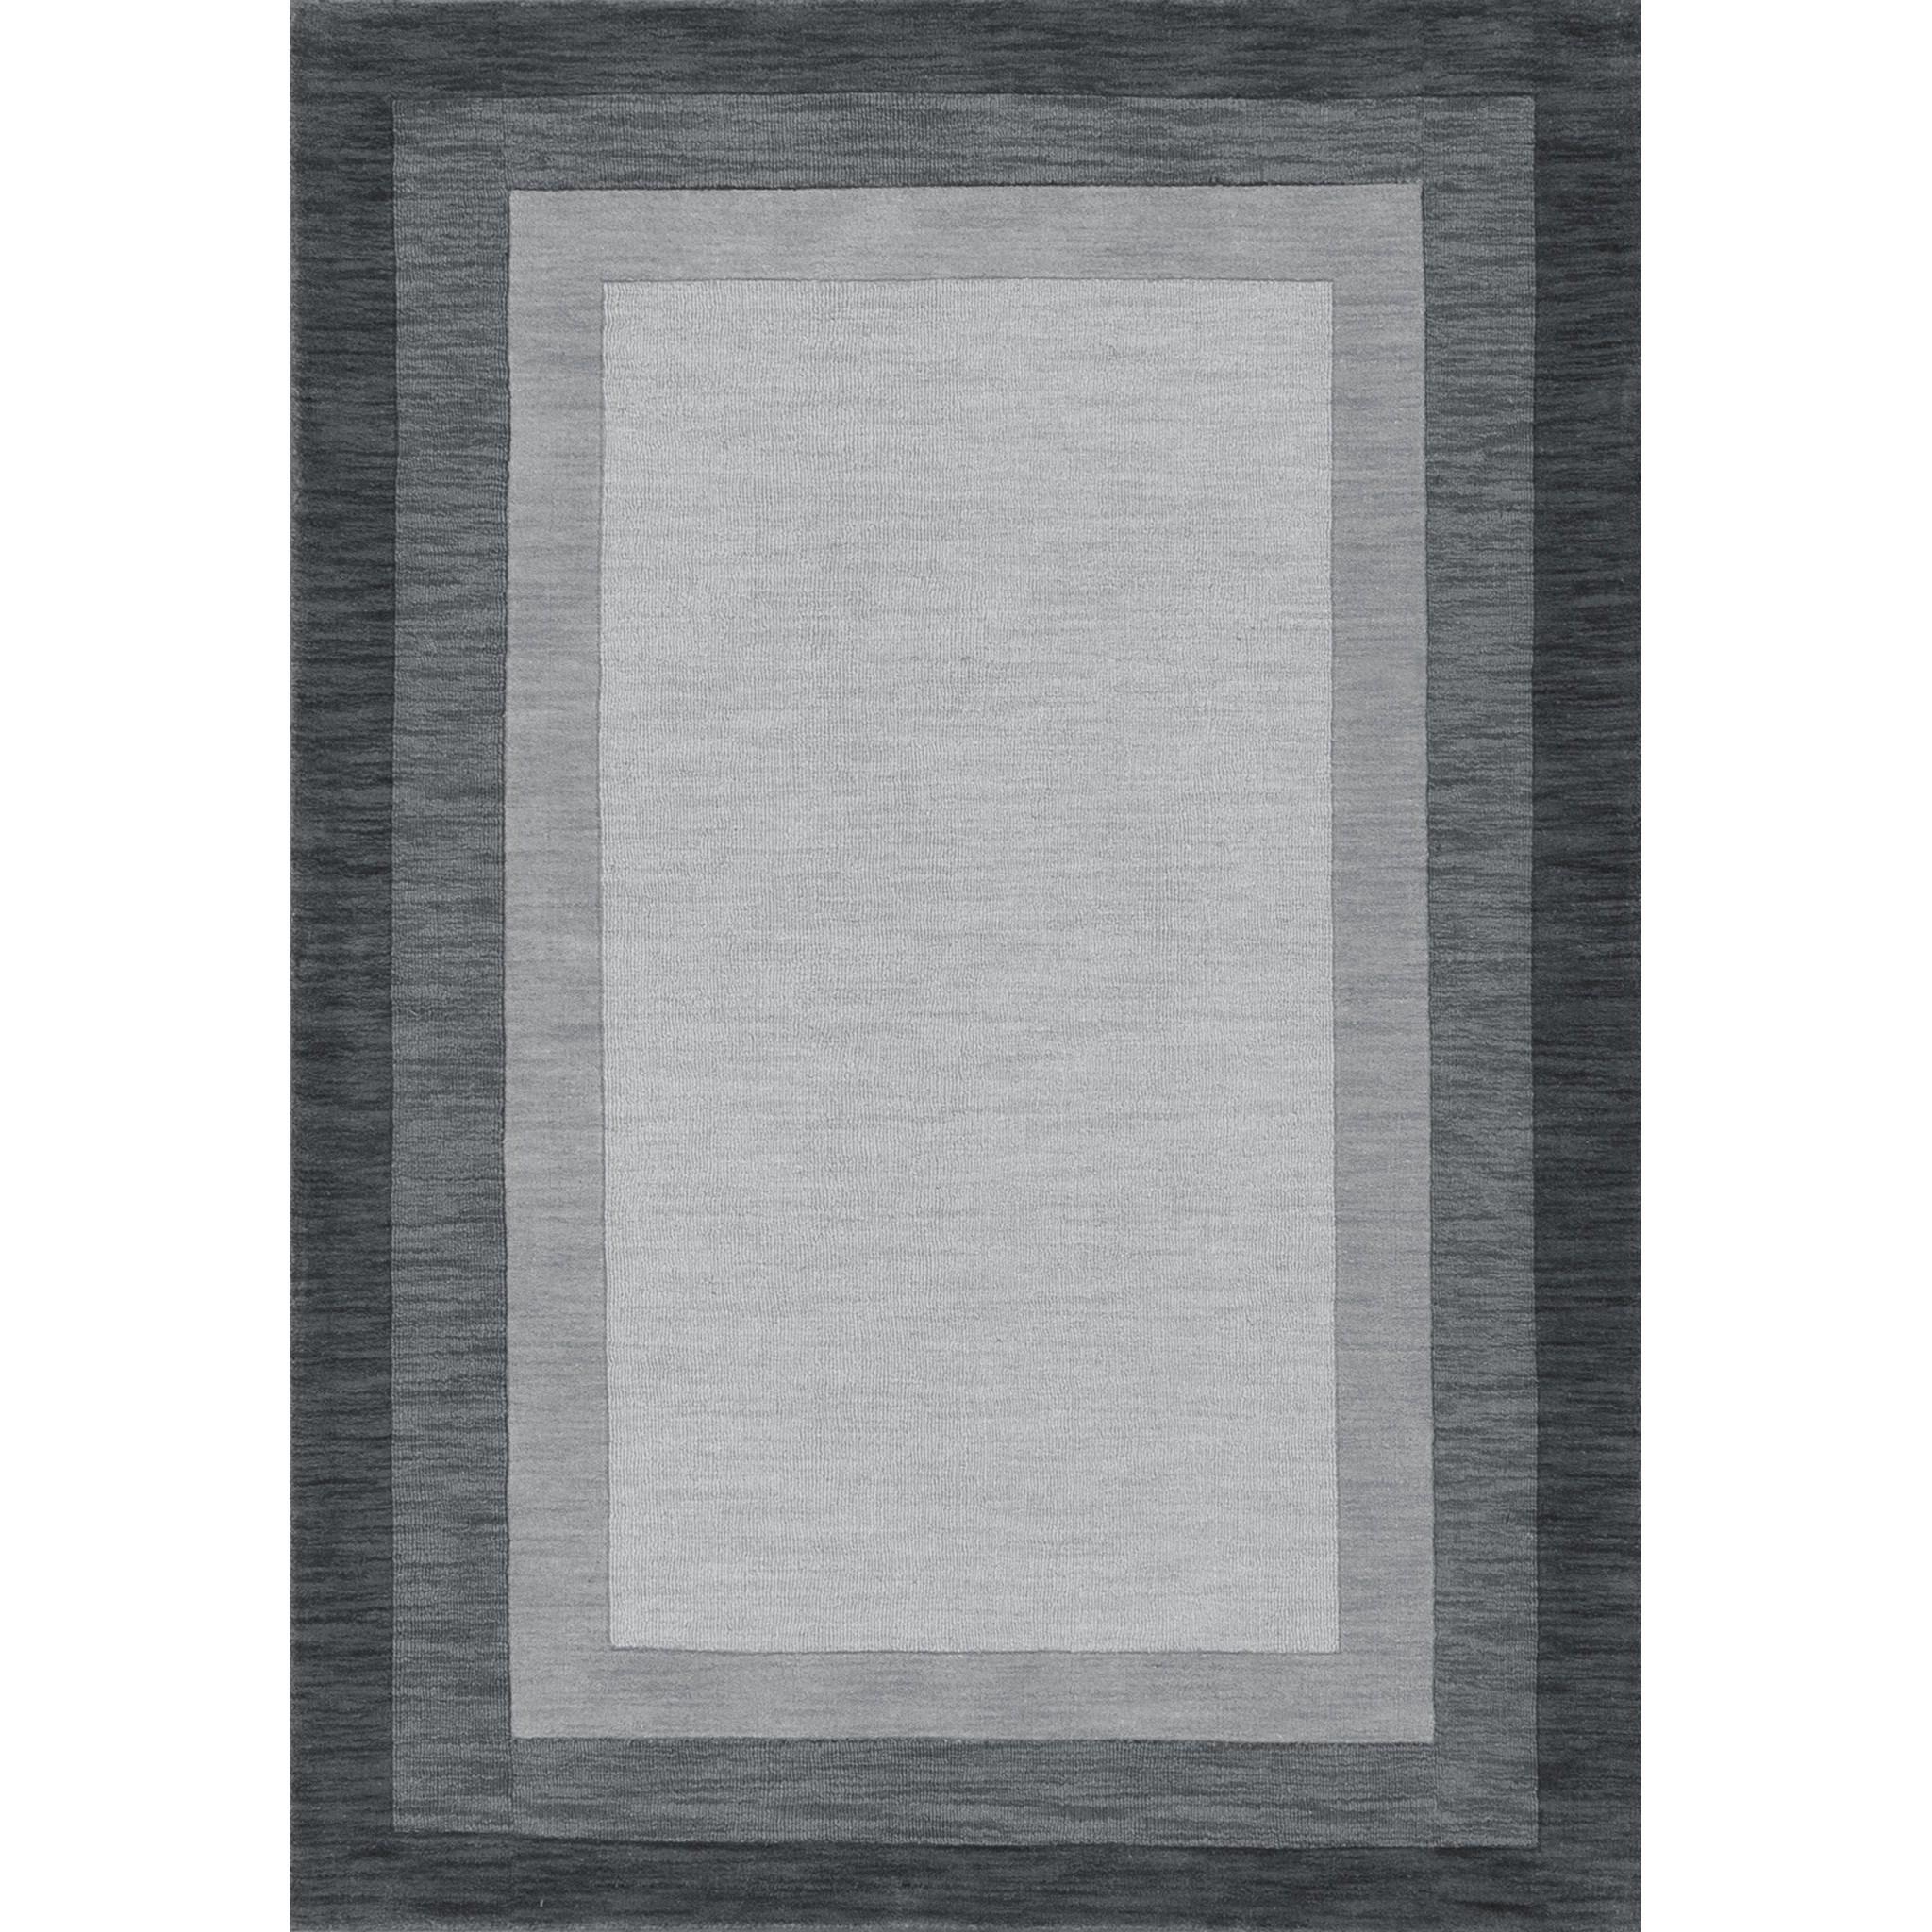 "Hamilton 3'-6"" x 5'-6"" Area Rug by Loloi Rugs at Sprintz Furniture"